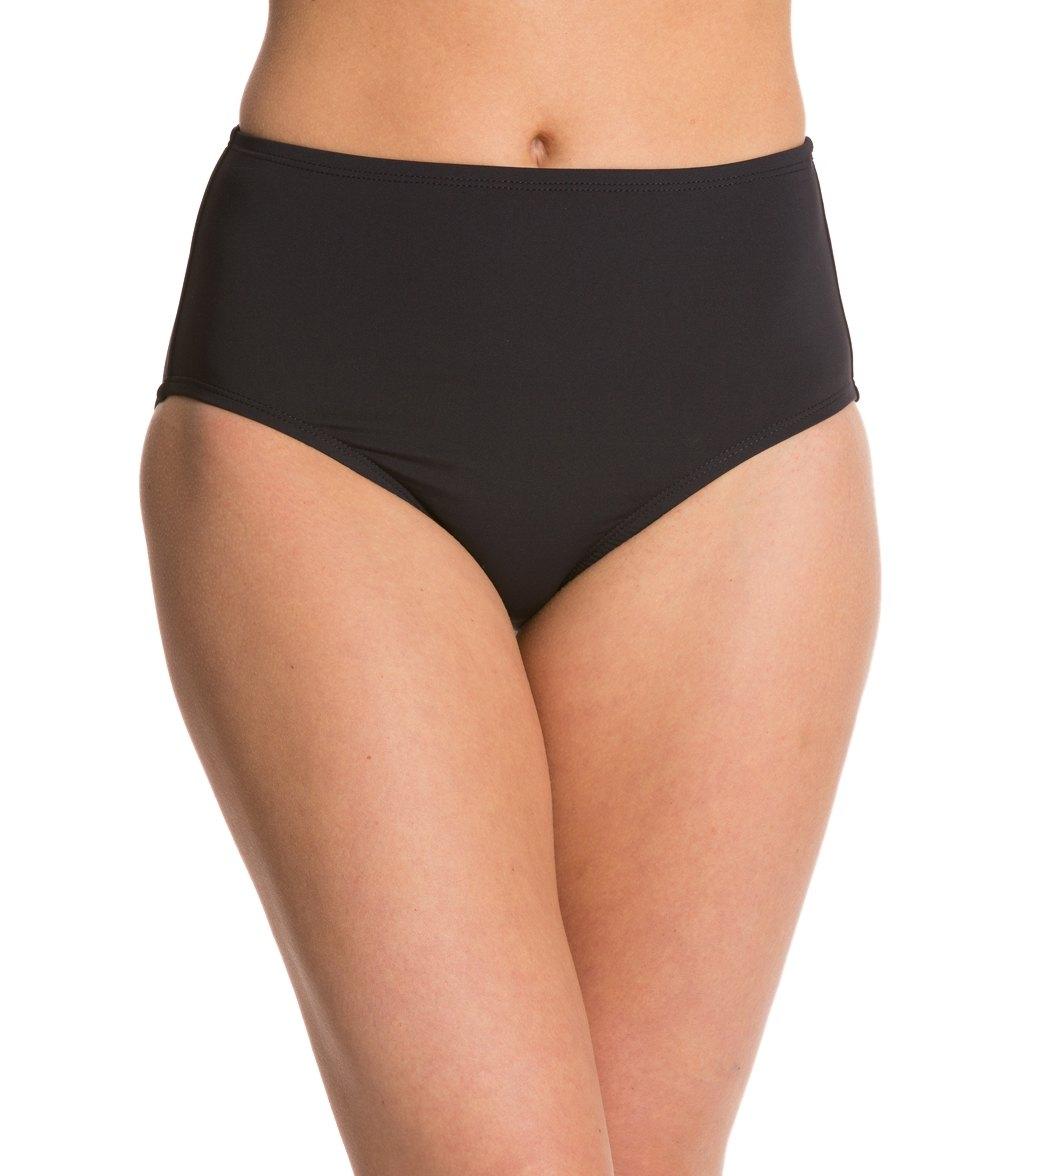 adc35e706154f ... Anne Cole Color Blast Solids High Waist Bikini Bottom. Play Video.  MODEL MEASUREMENTS